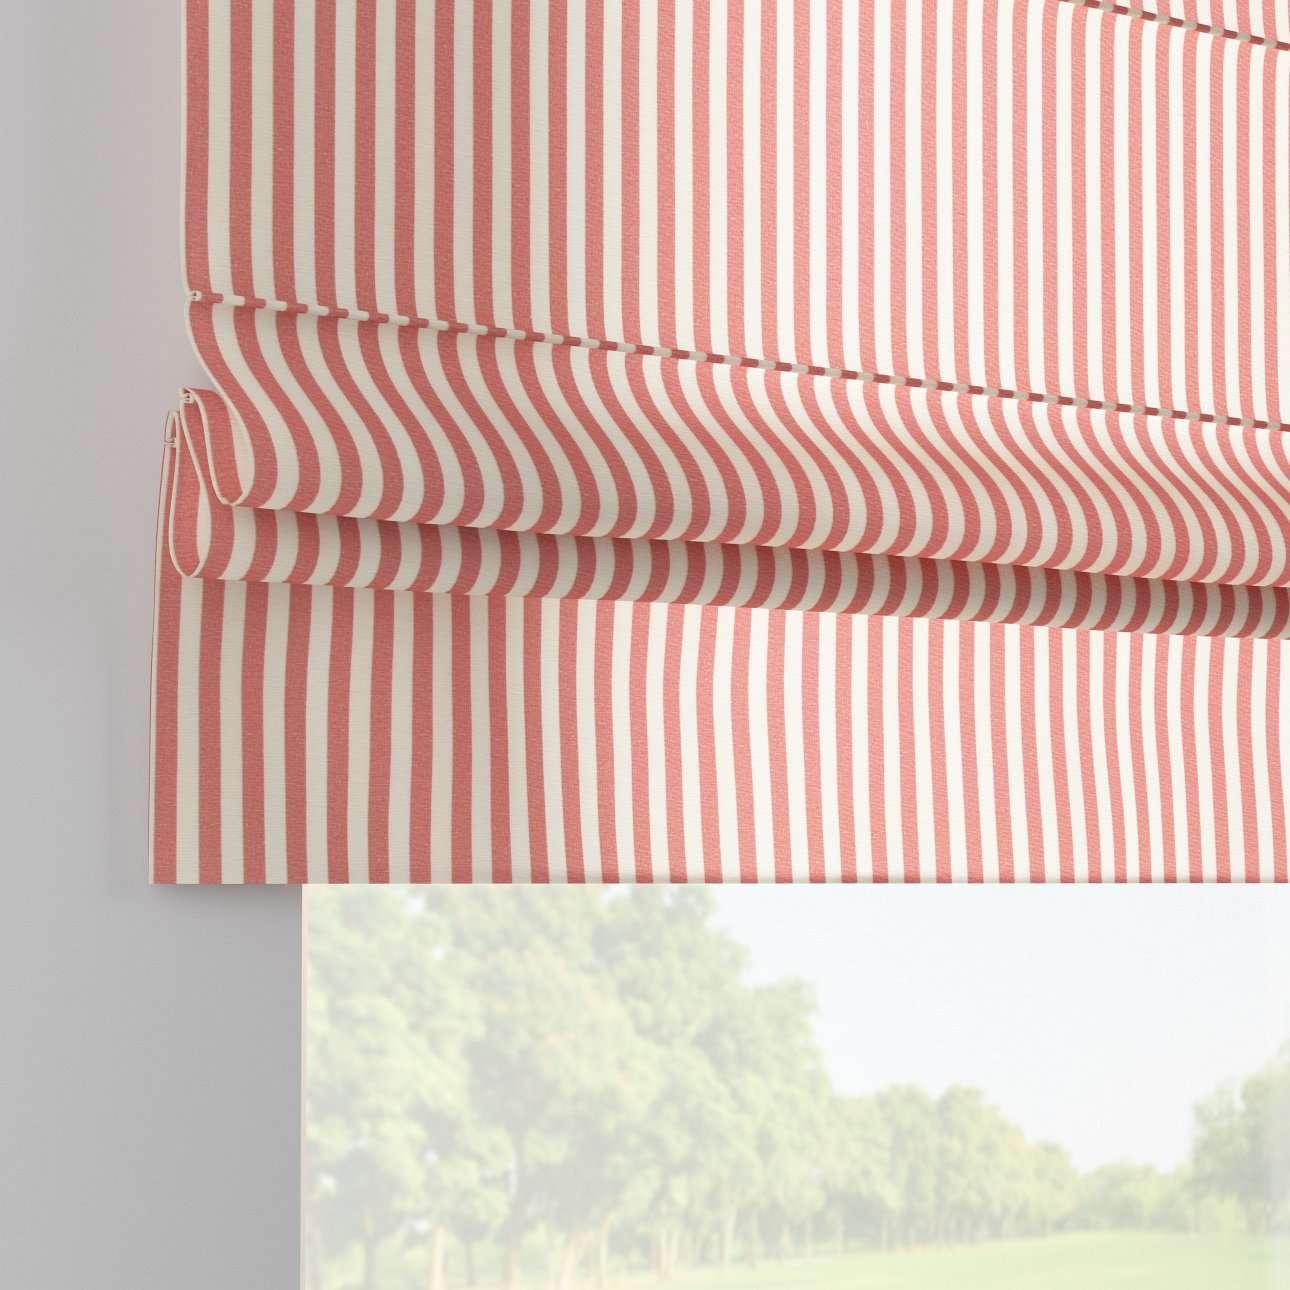 Romanetės Padva 80 x 170 cm (plotis x ilgis) kolekcijoje Quadro, audinys: 136-17